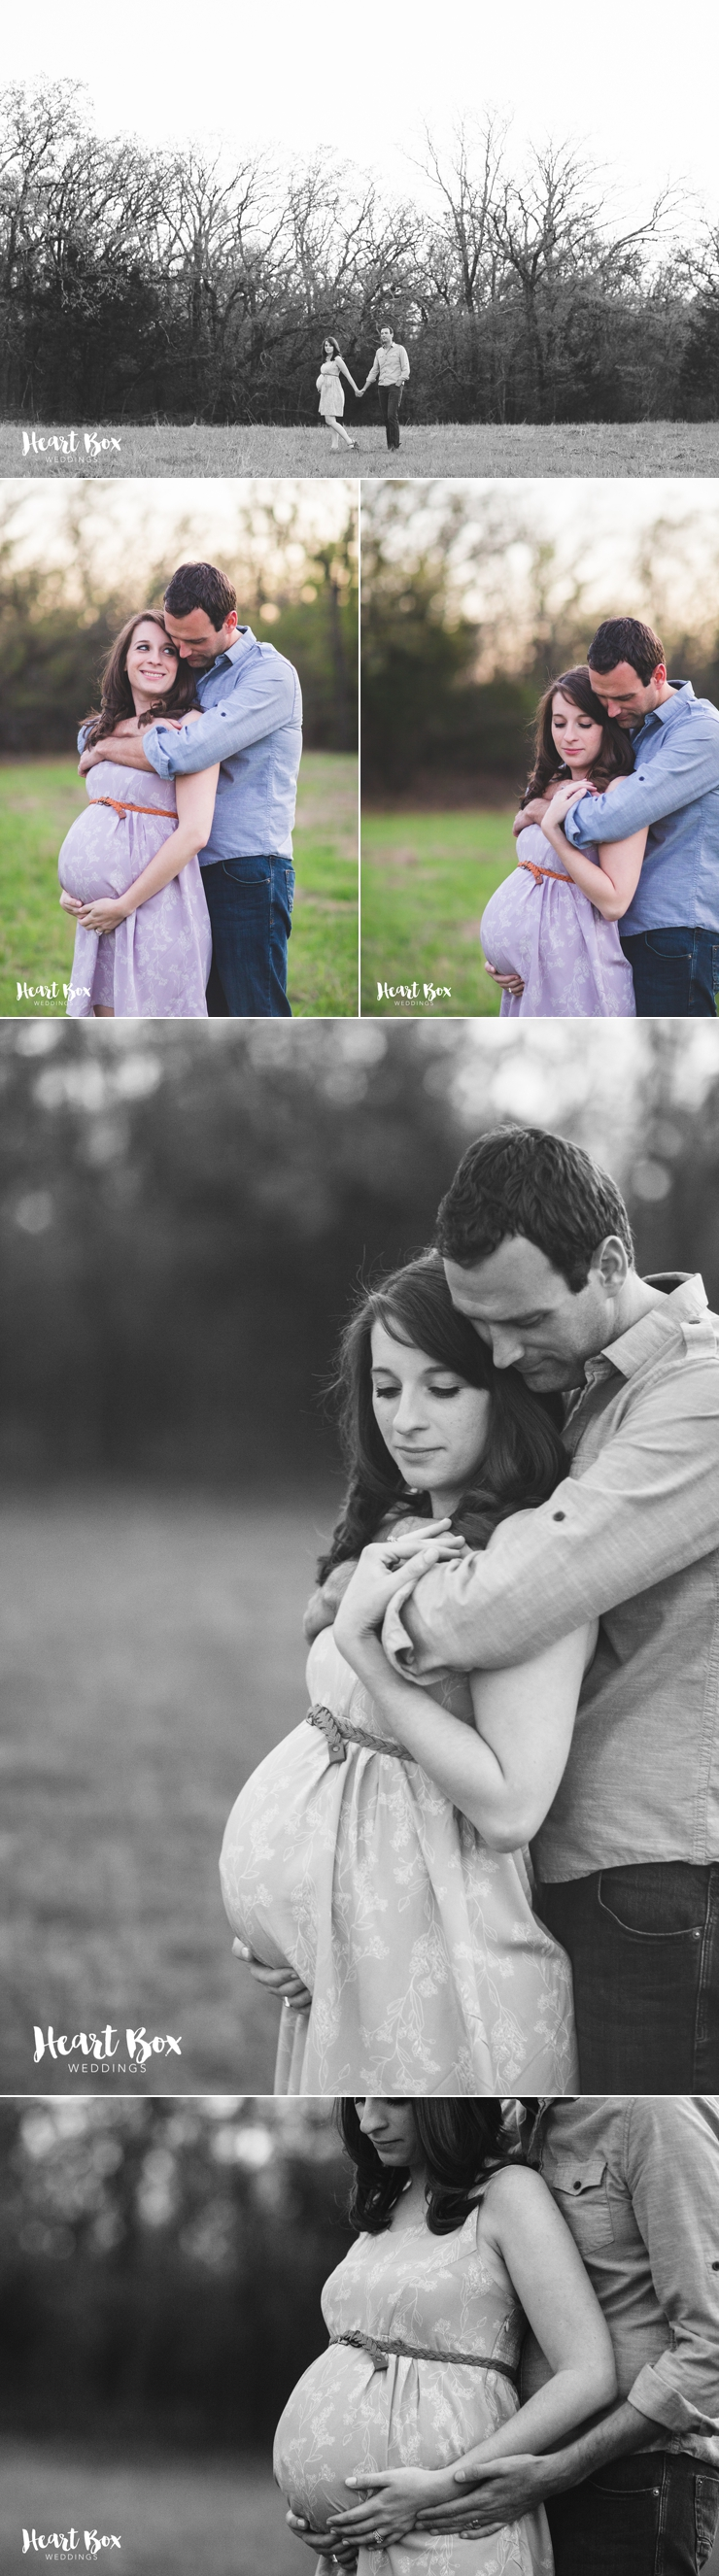 Jackson Maternity Blog Collages 6.jpg